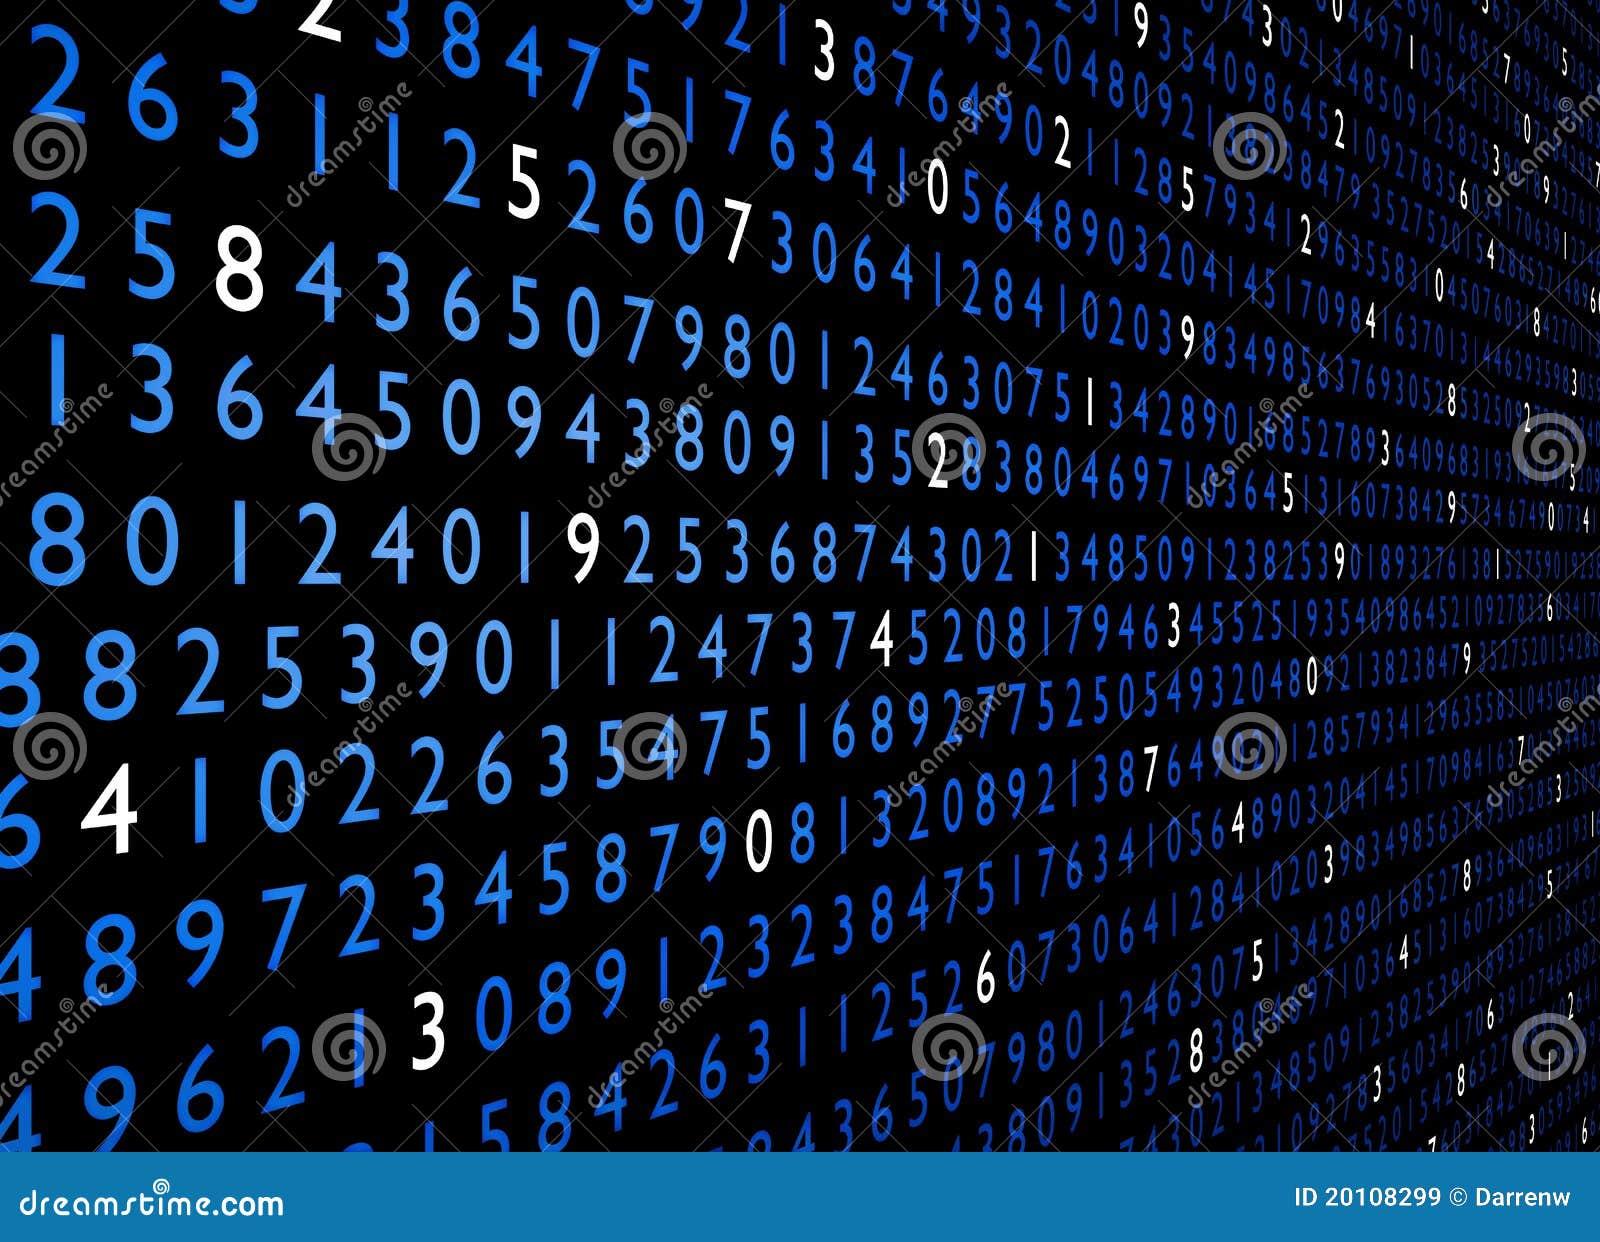 randomizer number